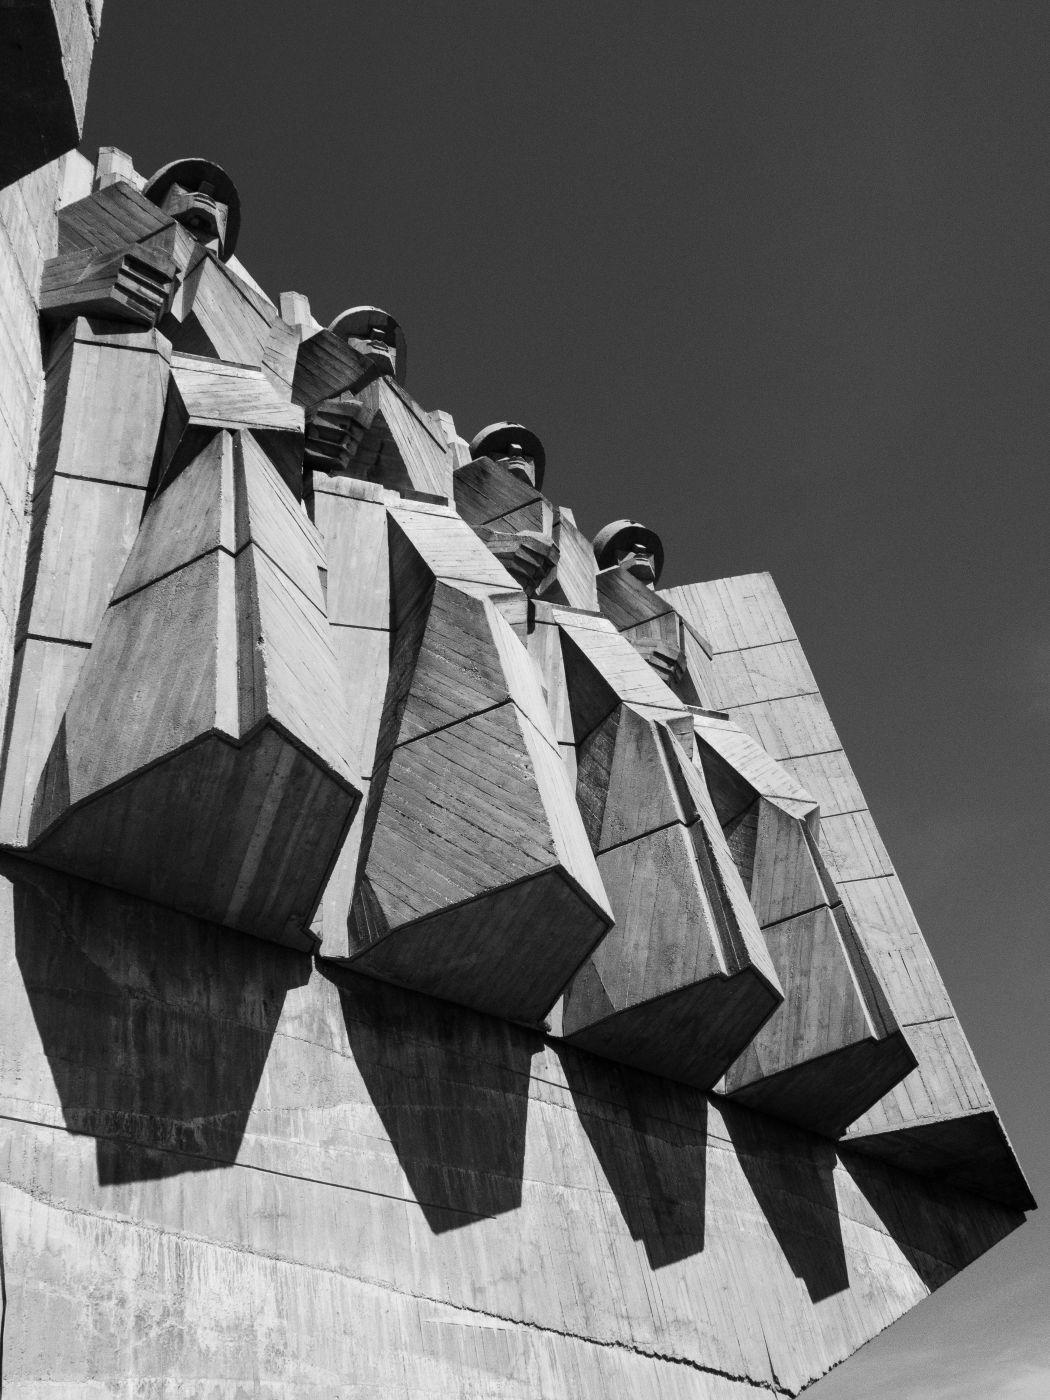 Varna - Varna Monument, Bulgaria